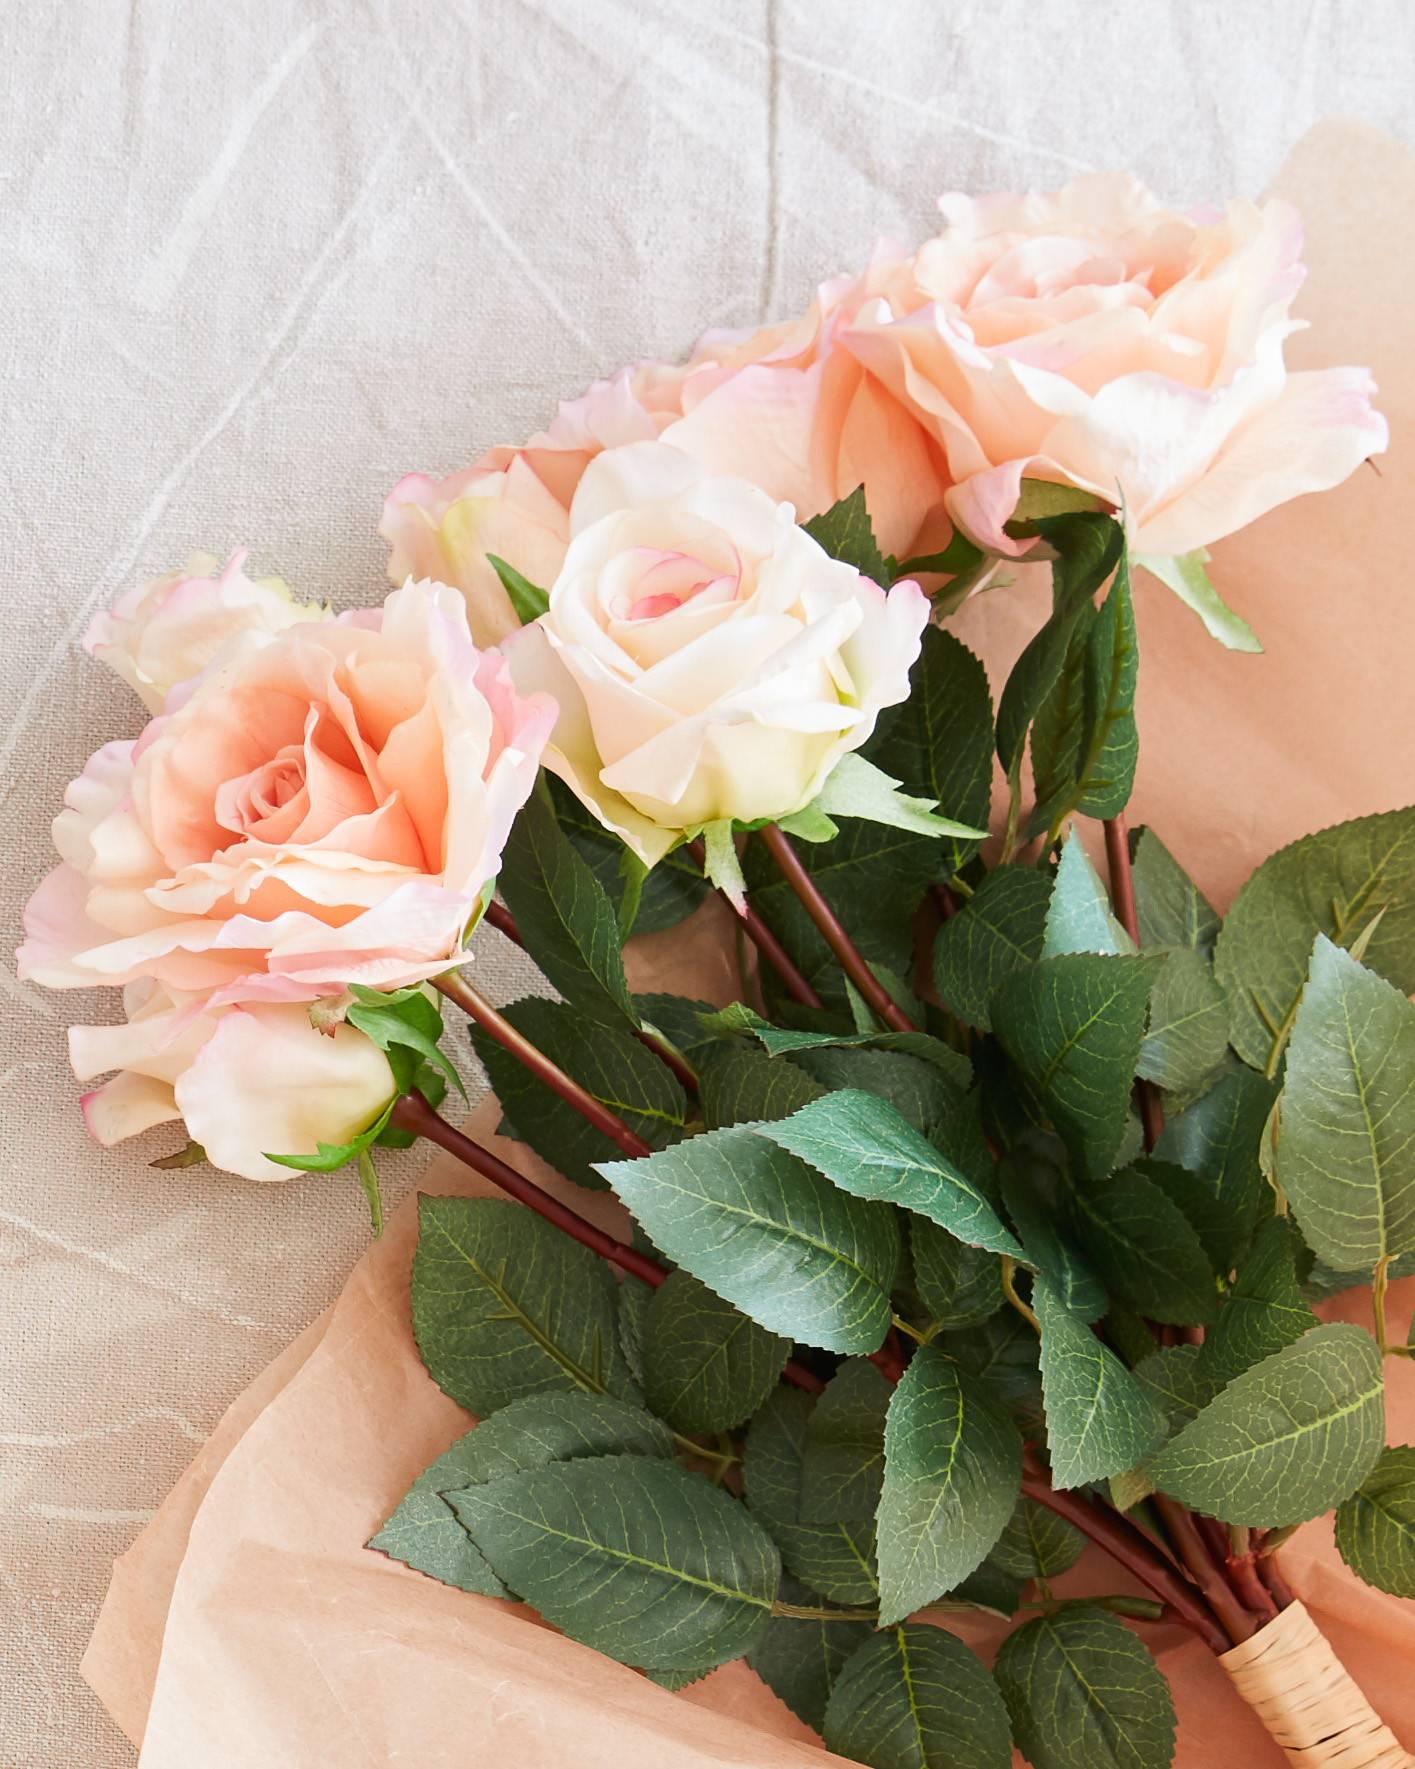 Rose flower stems balsam hill rose flower stems by balsam hill izmirmasajfo Images